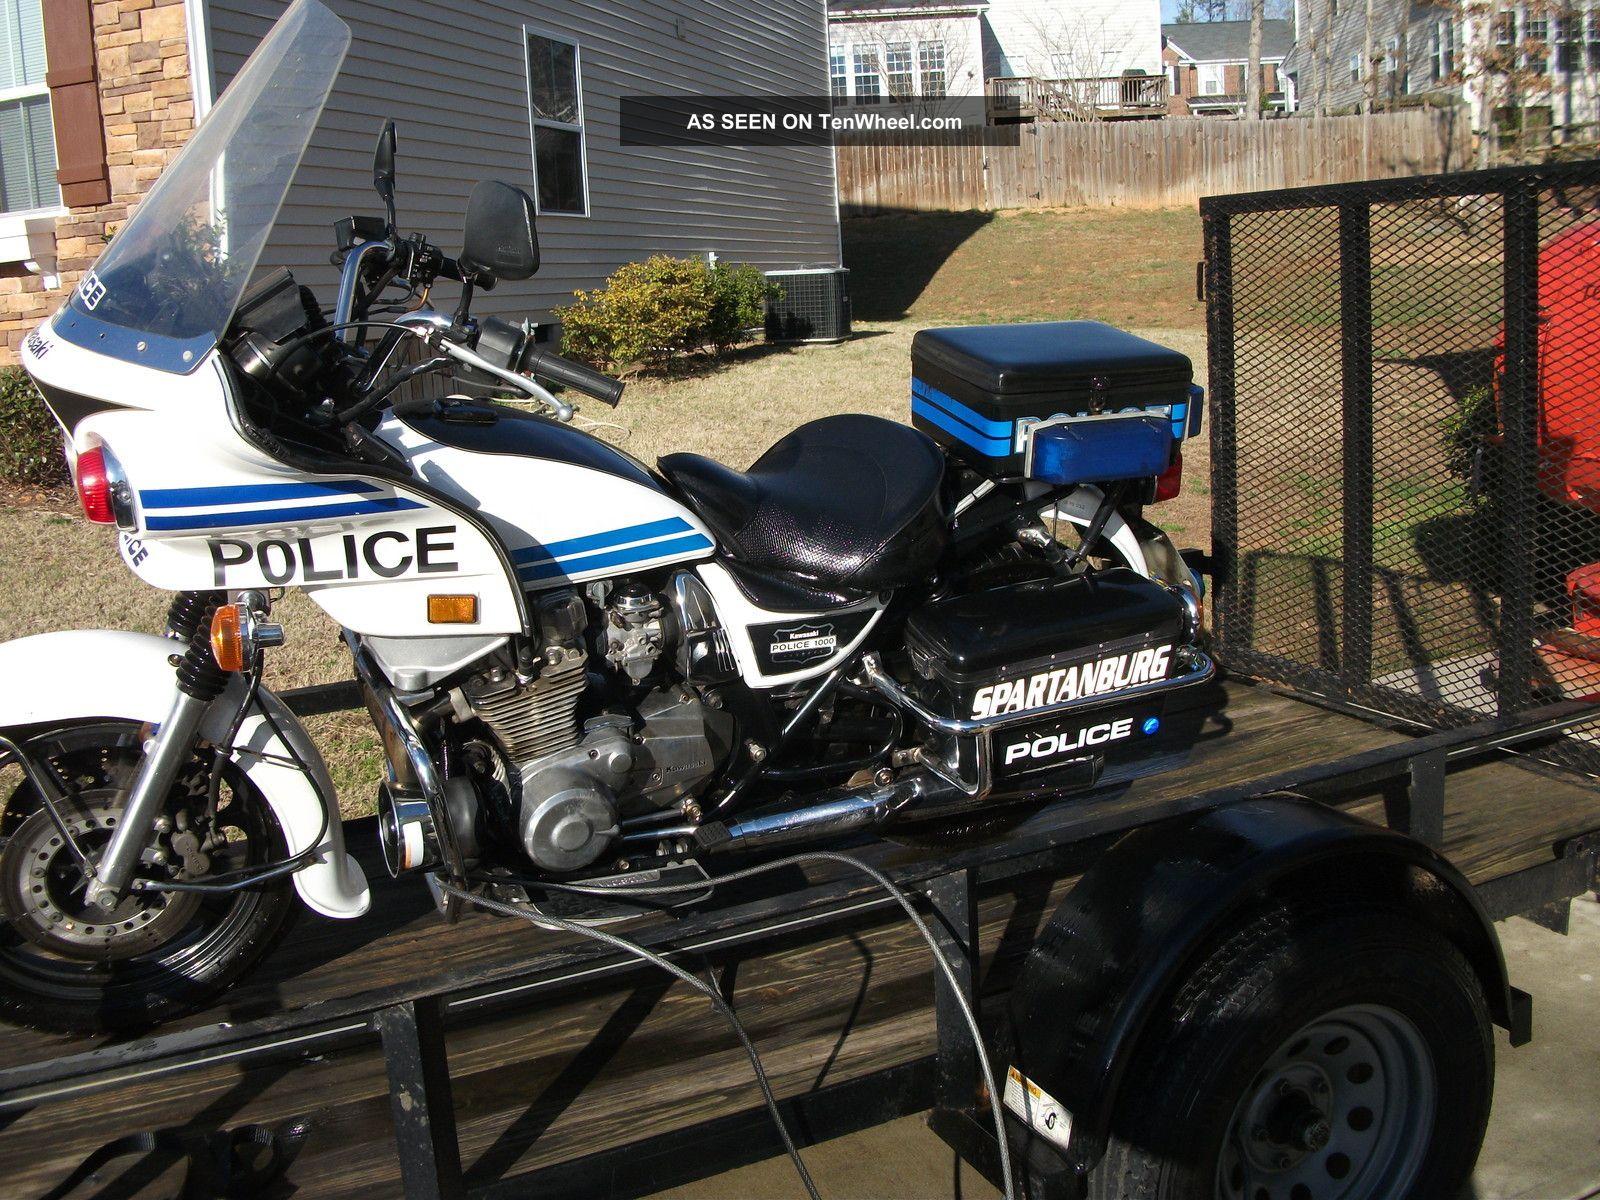 Kawasaki Kz Police Specs